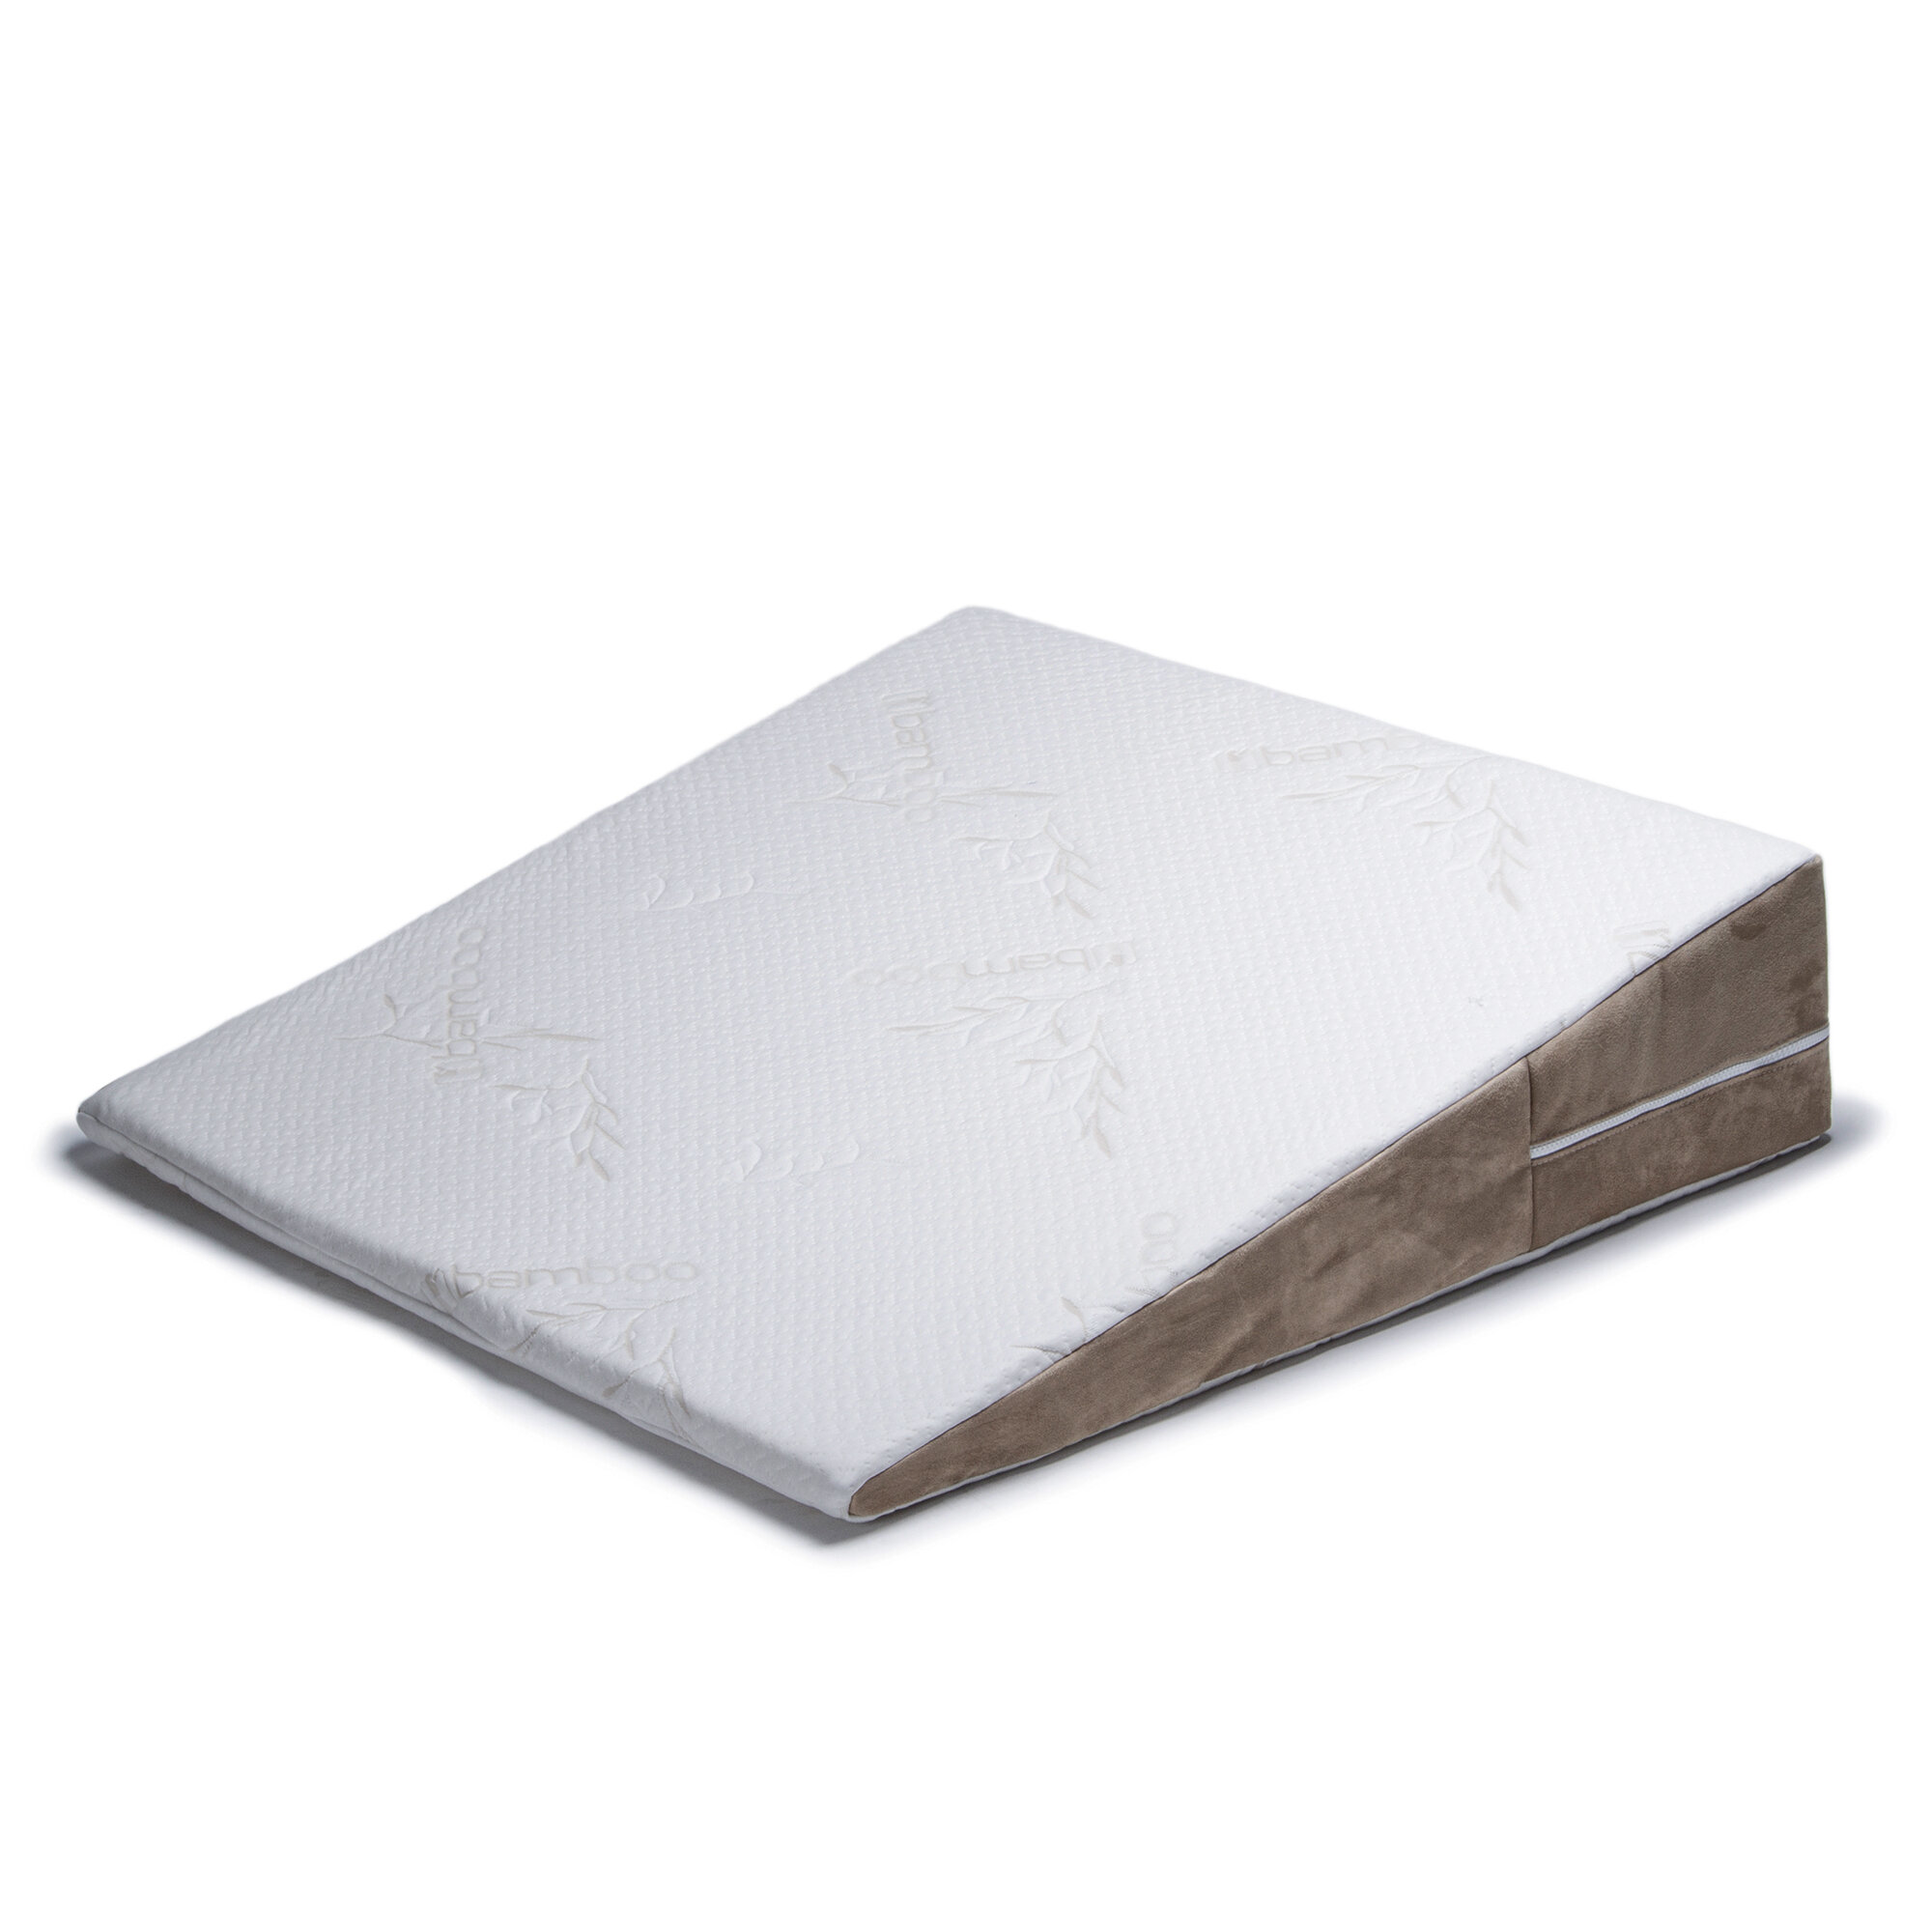 jaxx avana bed wedge memory foam pillow ebay